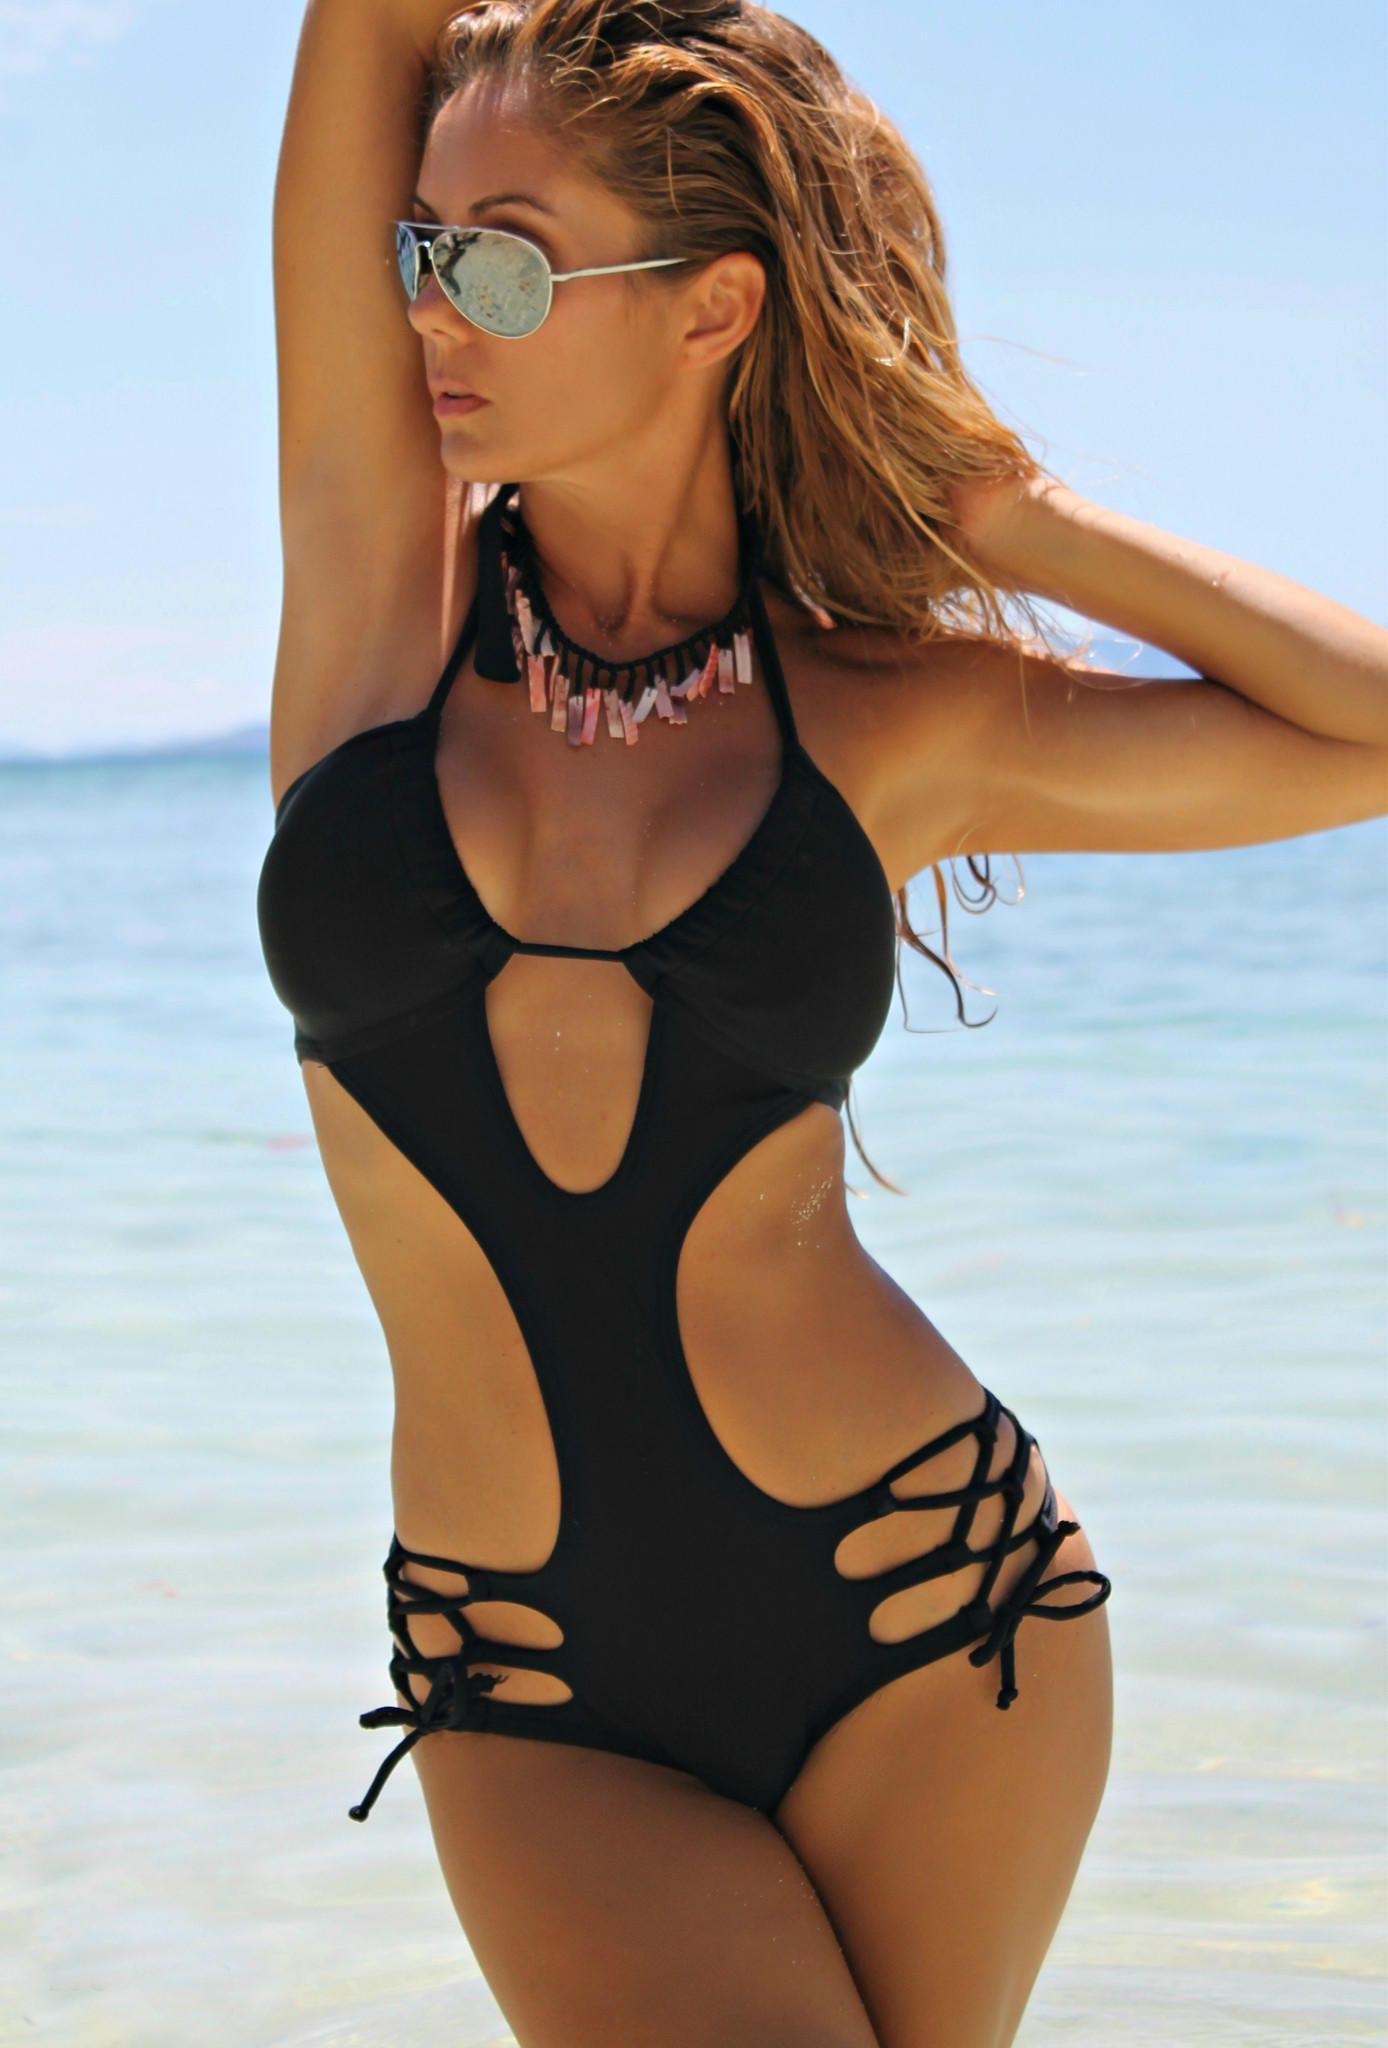 5a495027868ef ... Push Up Bikinis Set. Santa Cruz Monokini - Black Storm from Forever  Young Swimwear. Saved to Forever Young Swimwear.